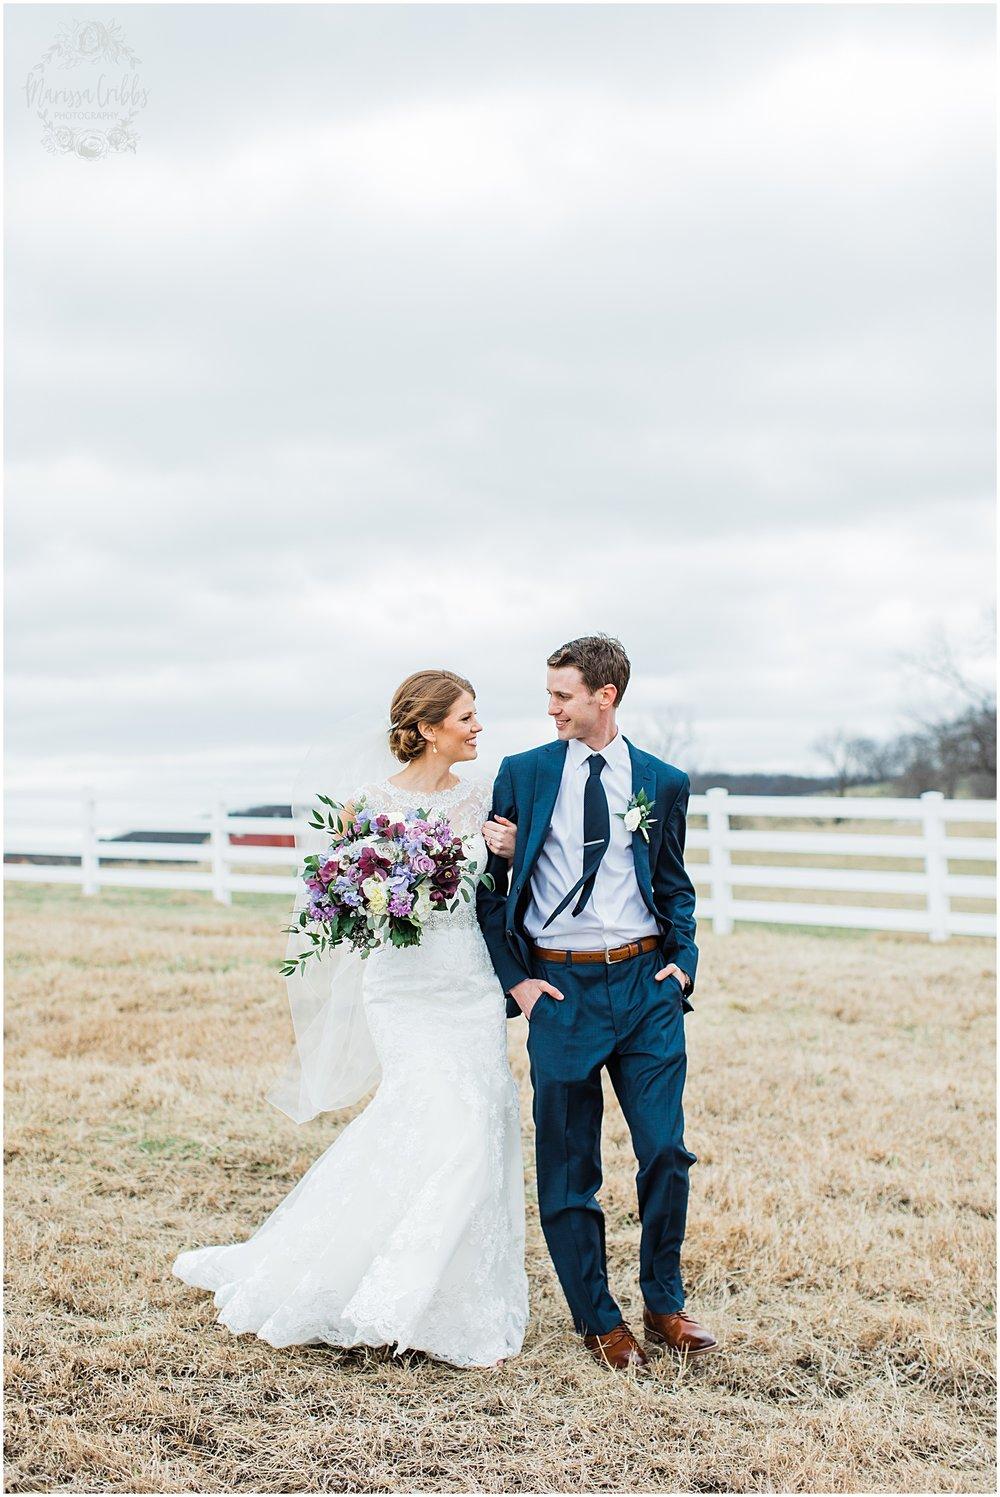 JACOBI WEDDING | 1890 EVENT SPACE | MARISSA CRIBBS PHOTOGRAPHY_4288.jpg